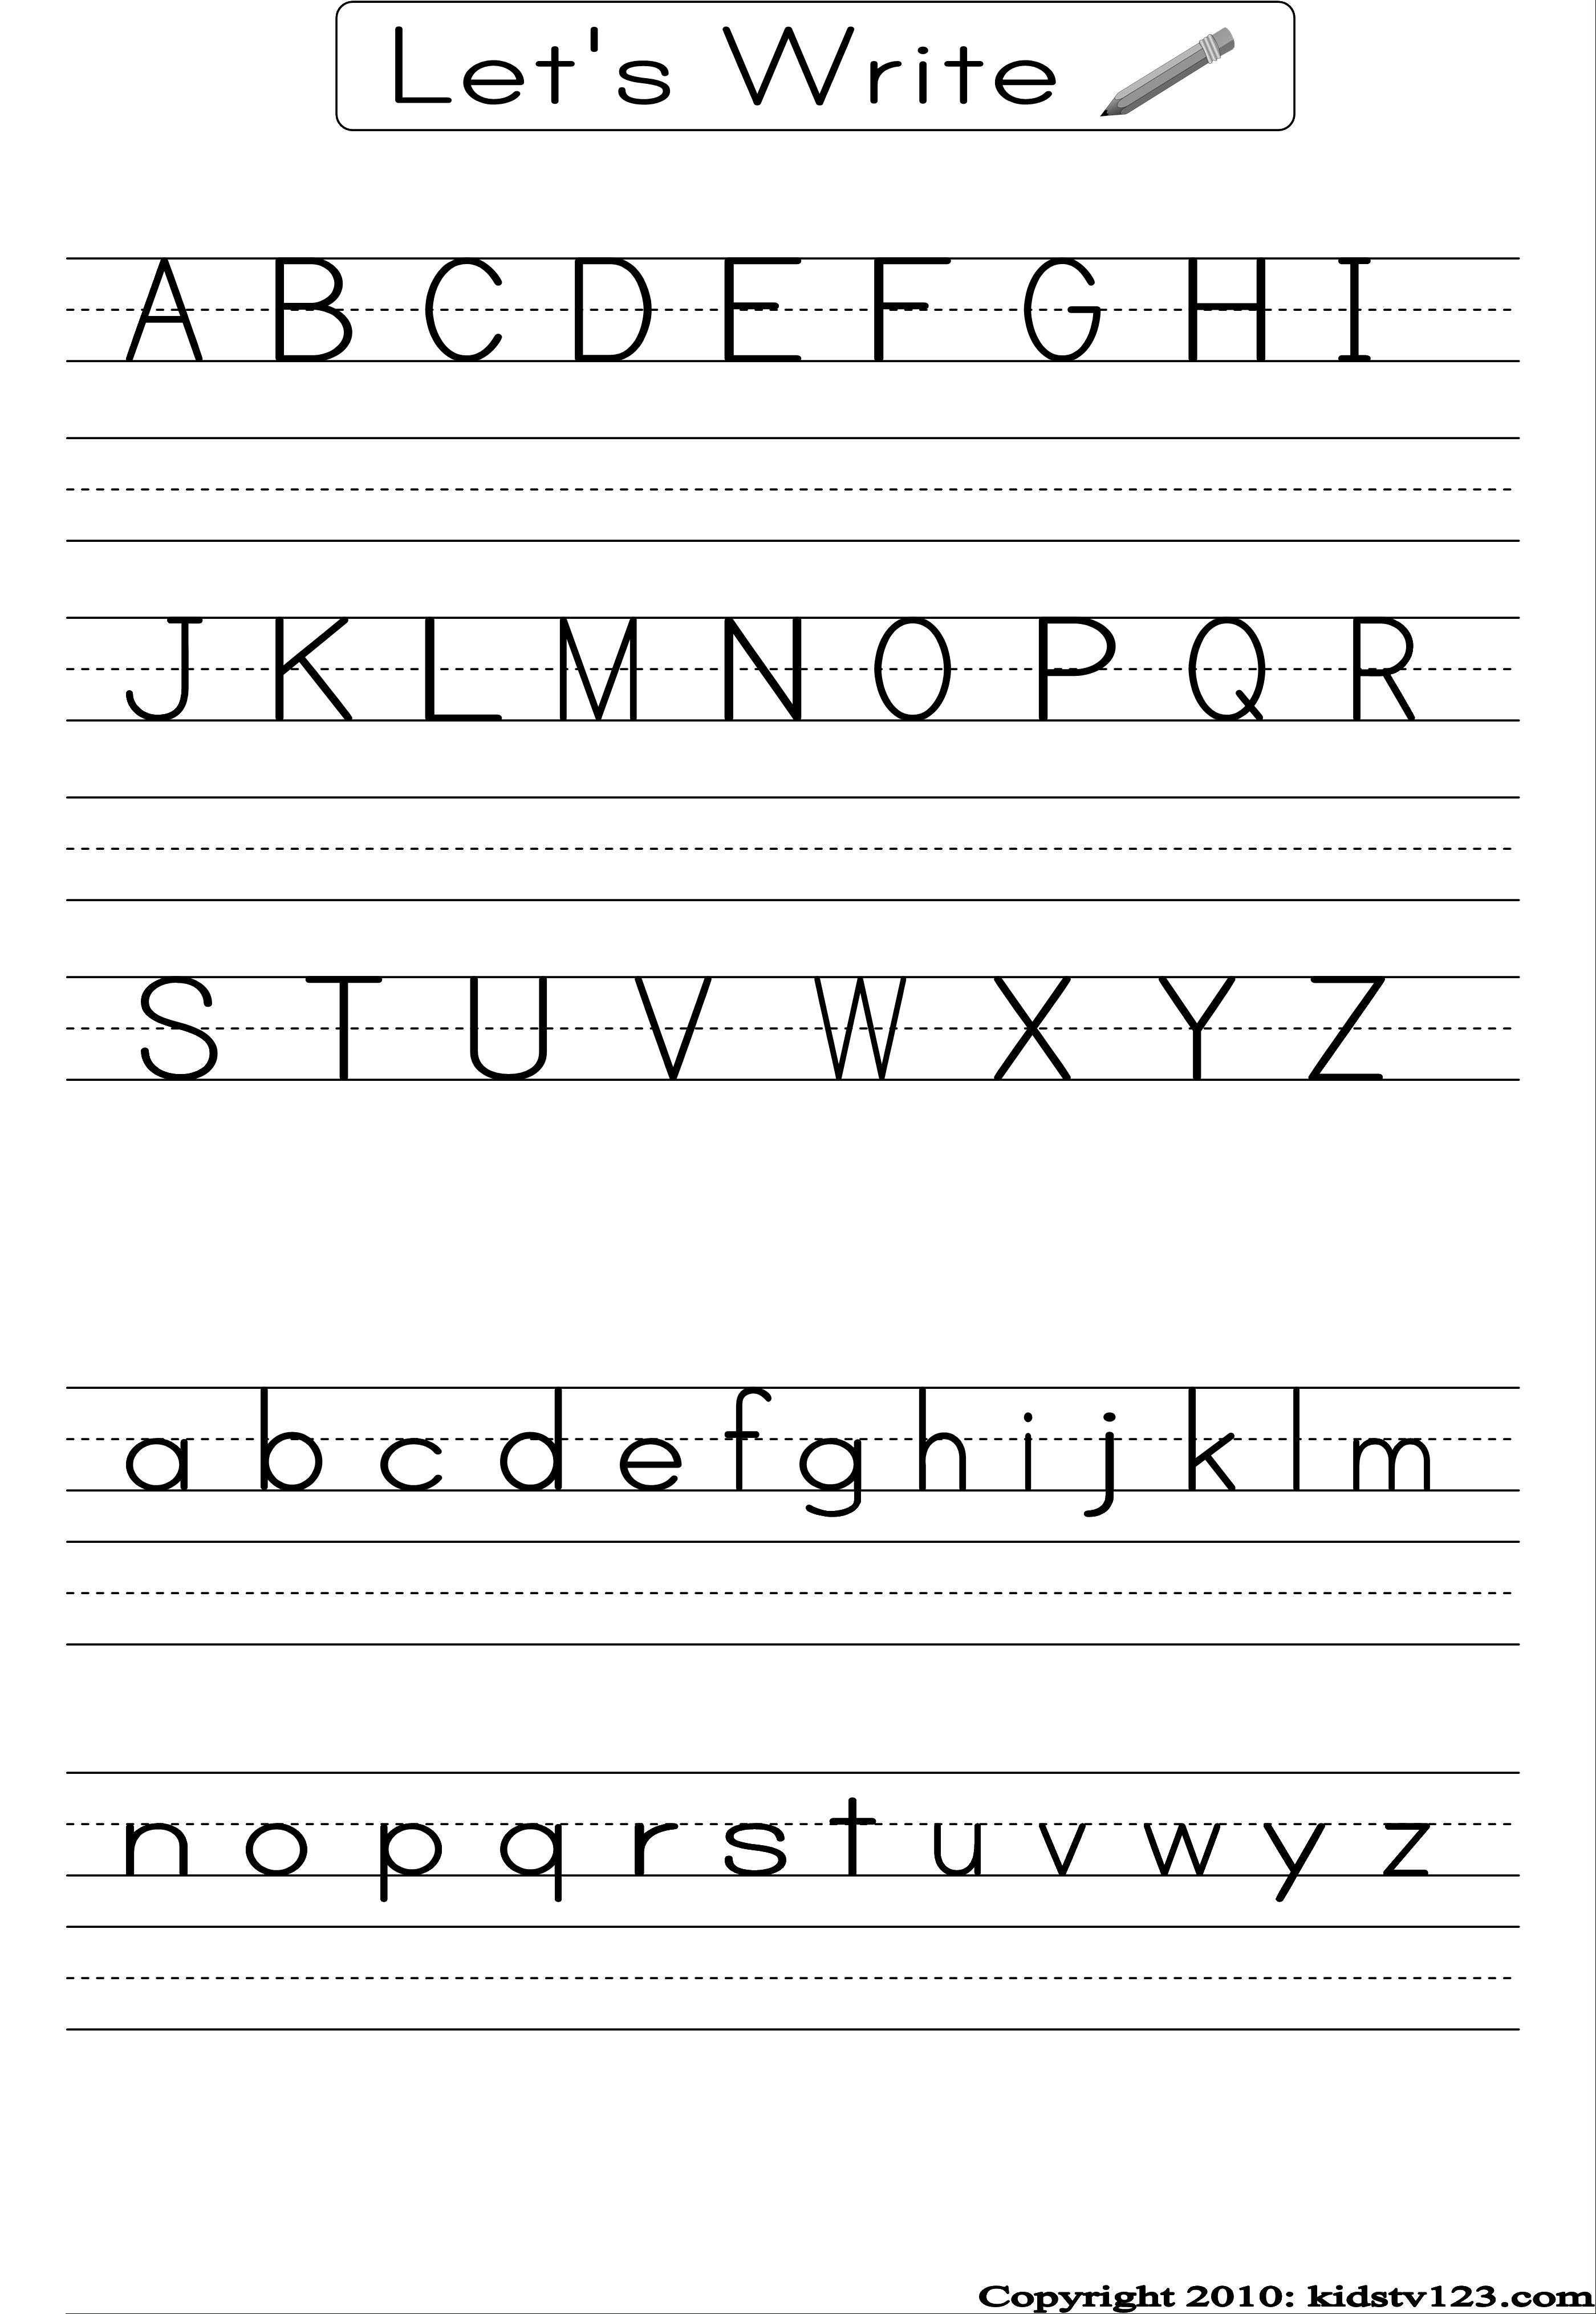 897502E4311627D8B756184483C0D2Ea (2799×4057) | Alphabet for Alphabet Handwriting Worksheets For Preschool